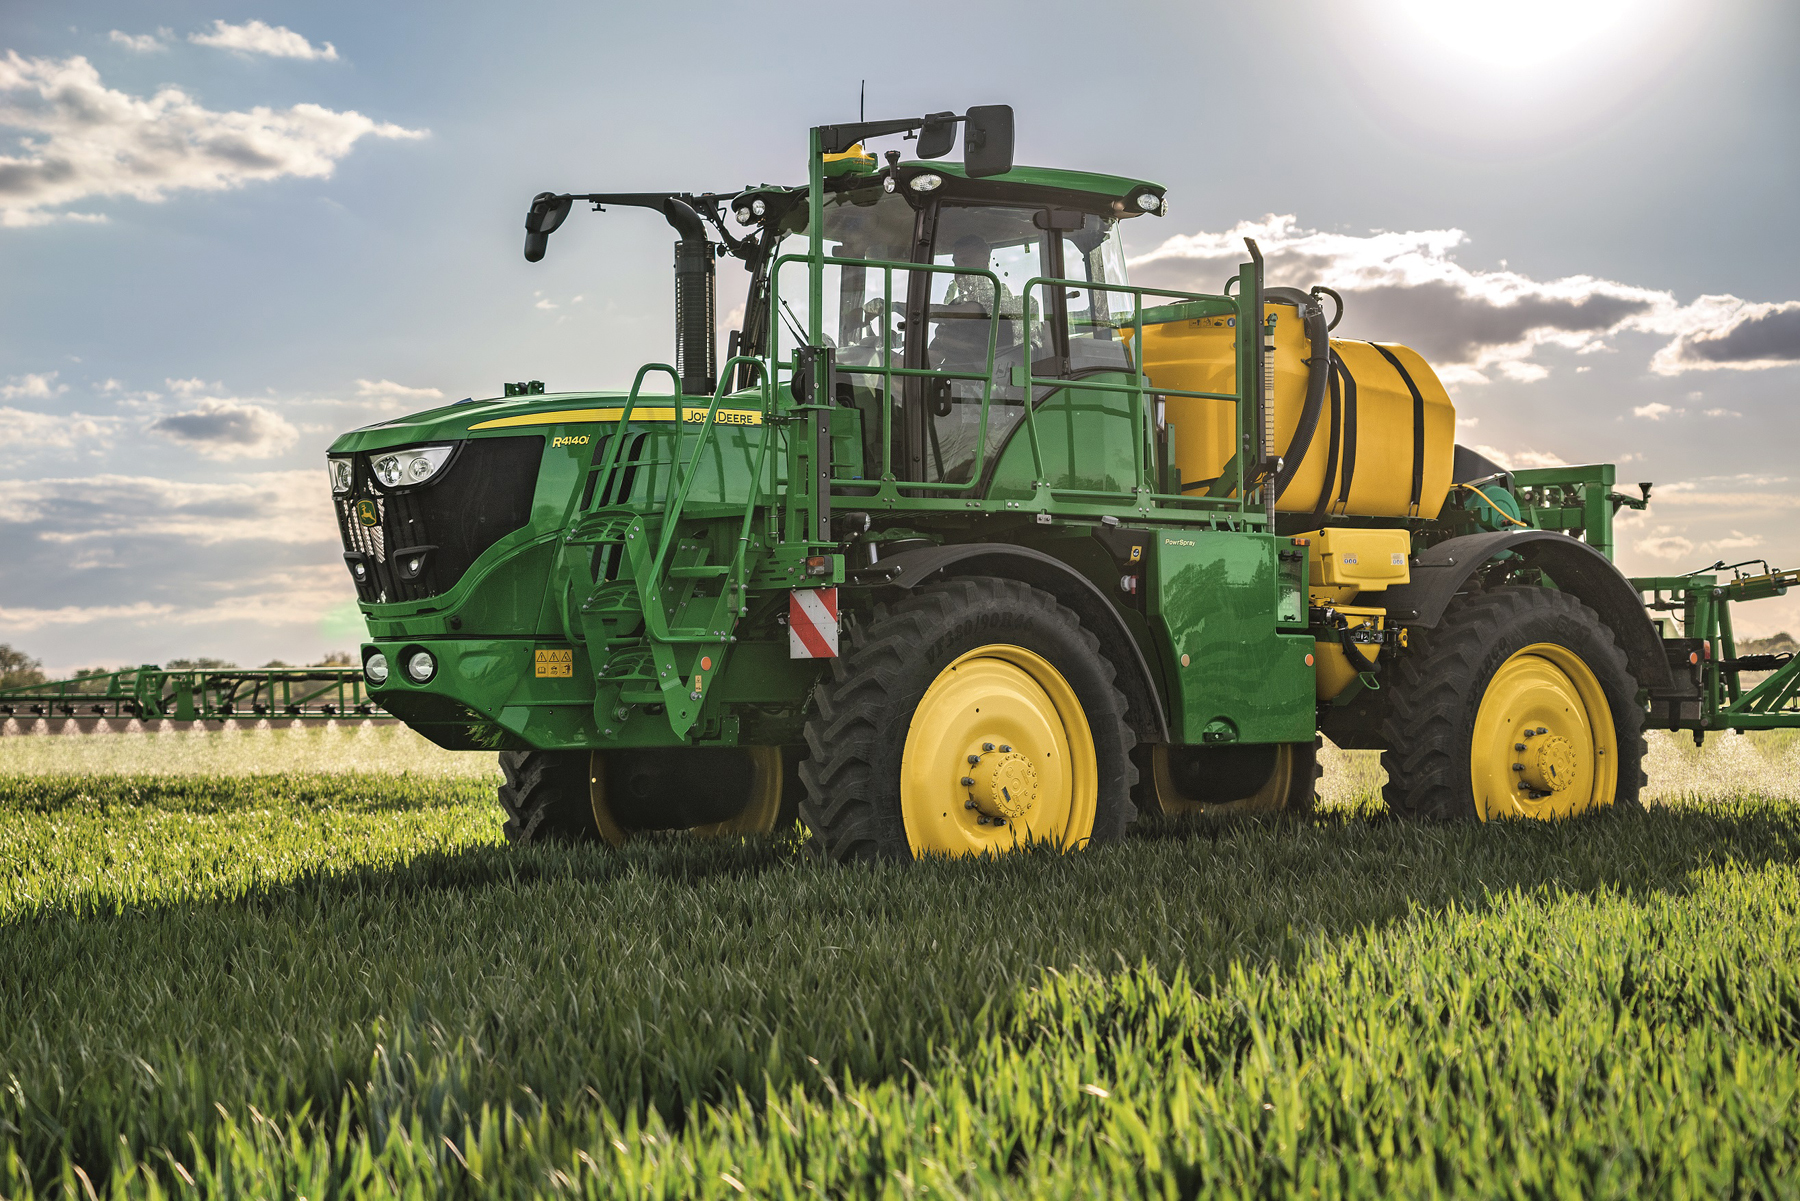 New self-propelled sprayers from John Deere